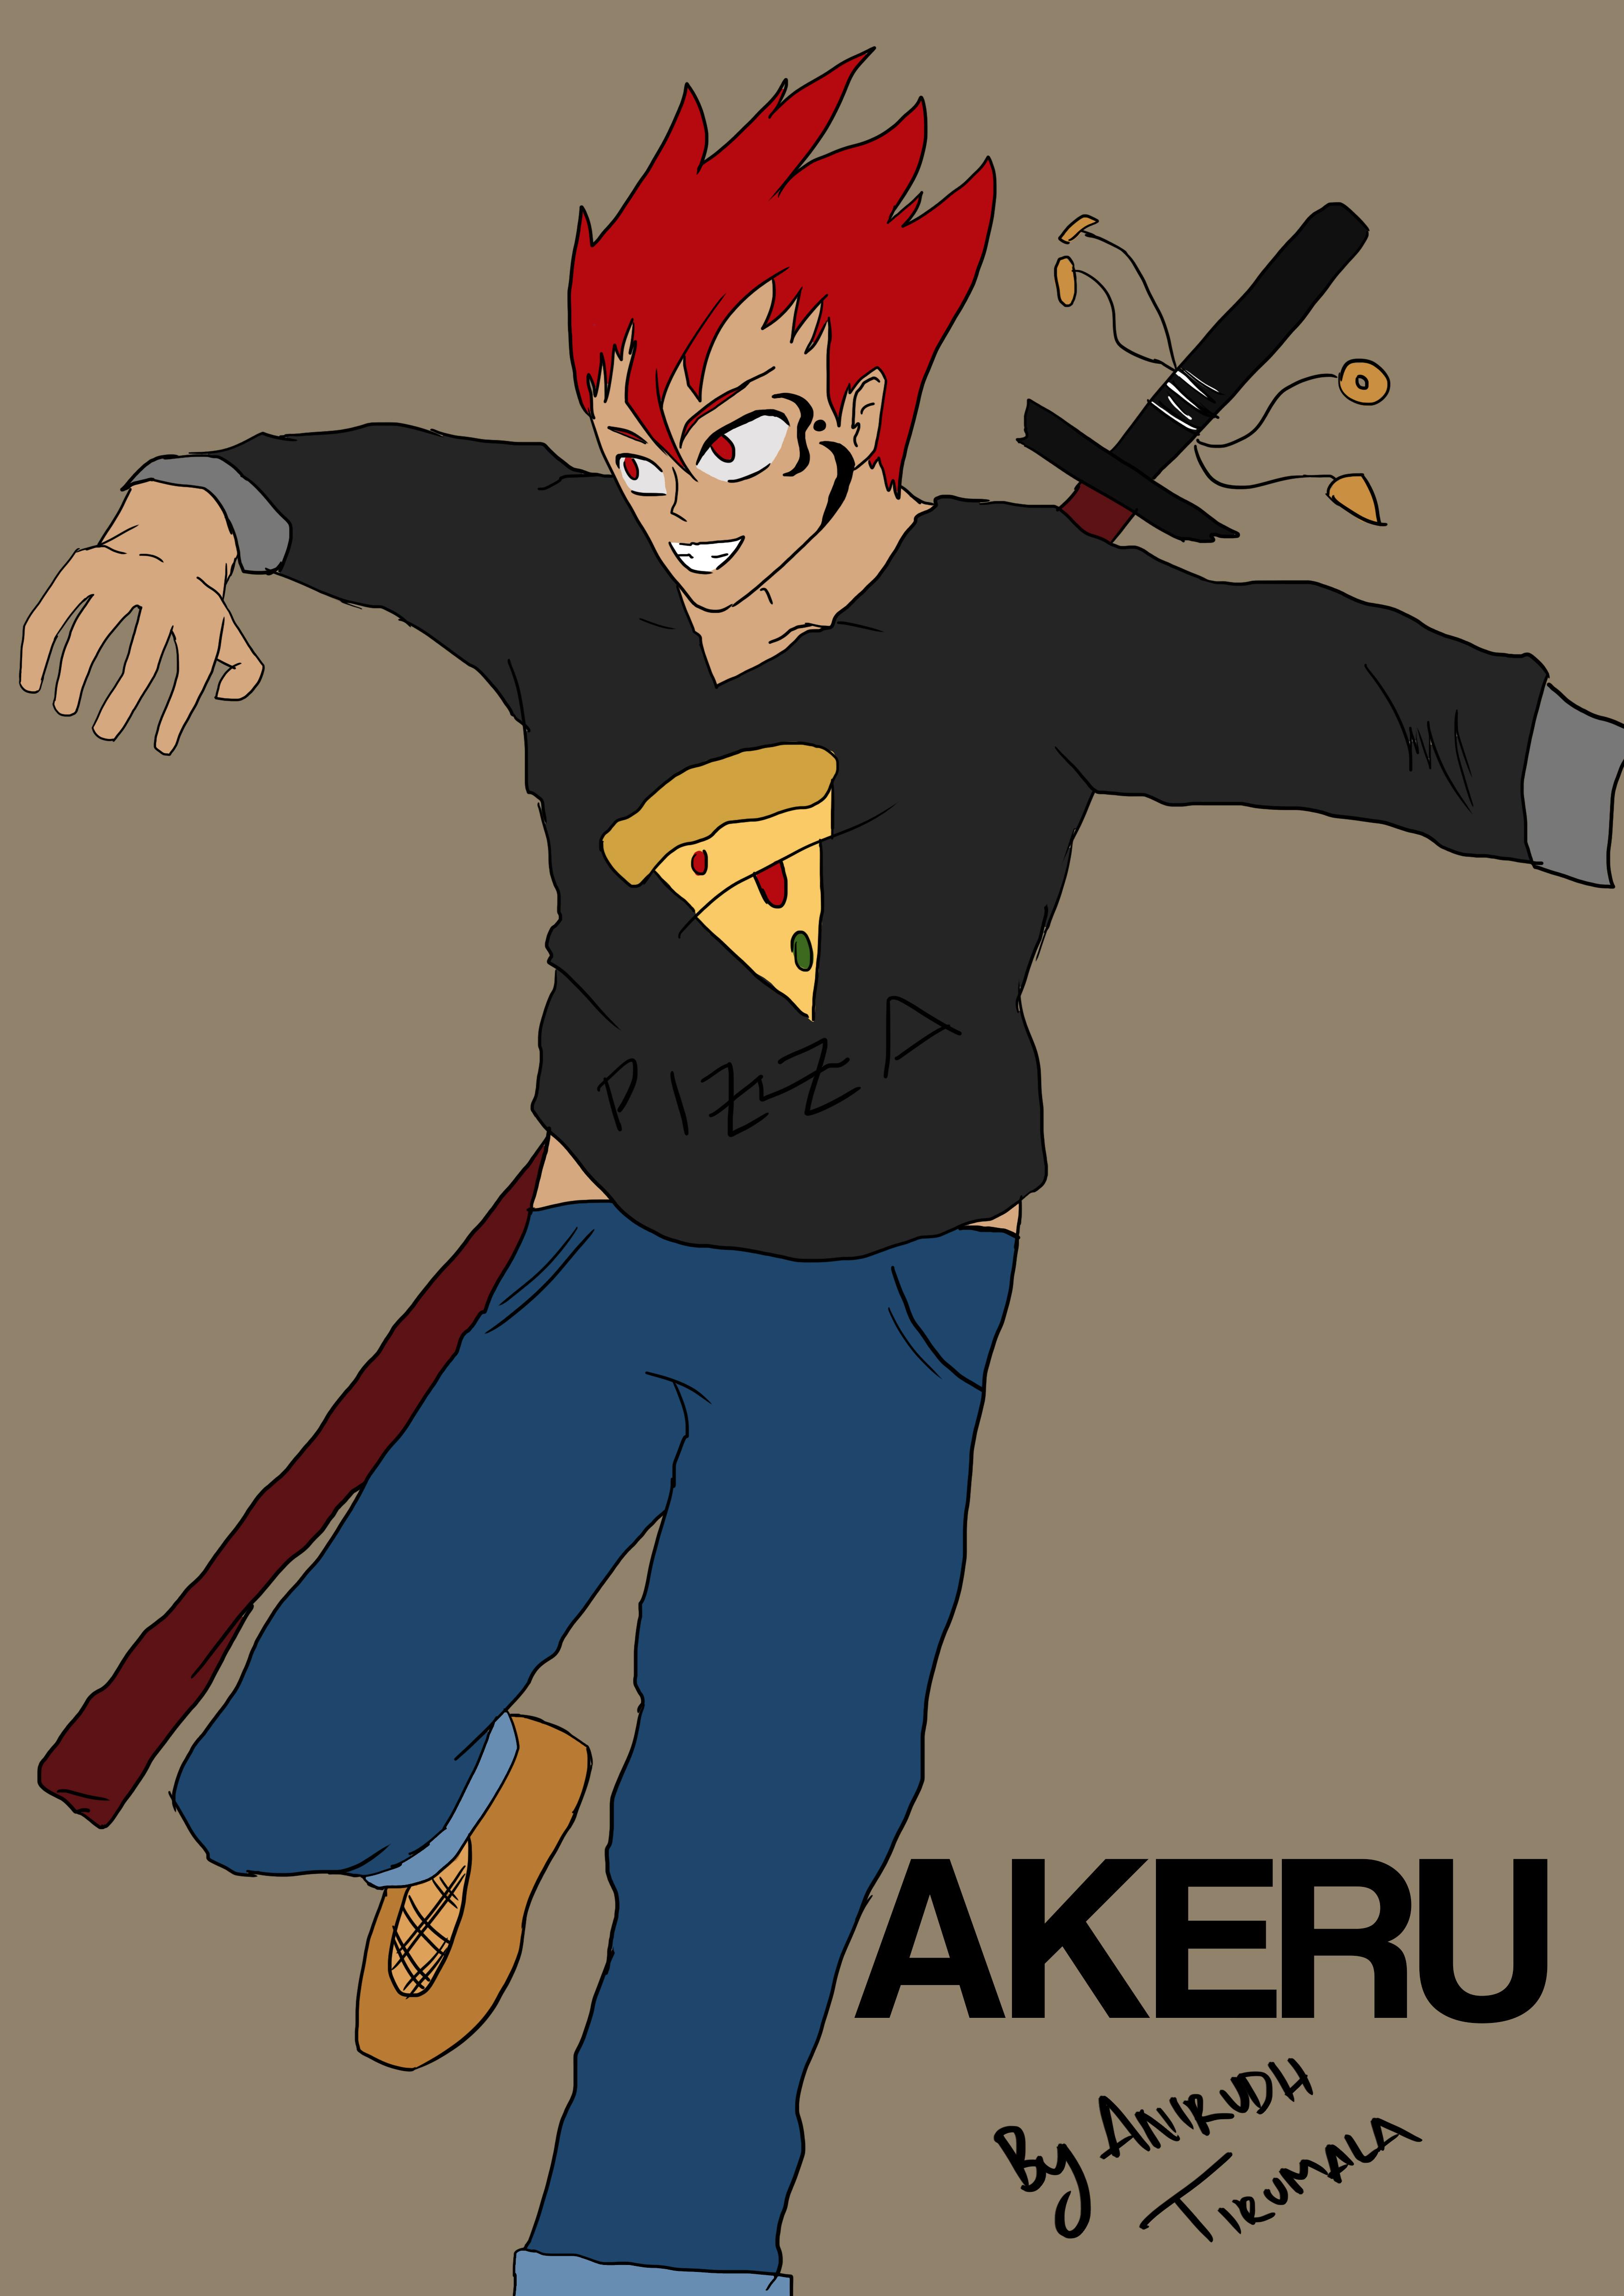 Akeru Character design